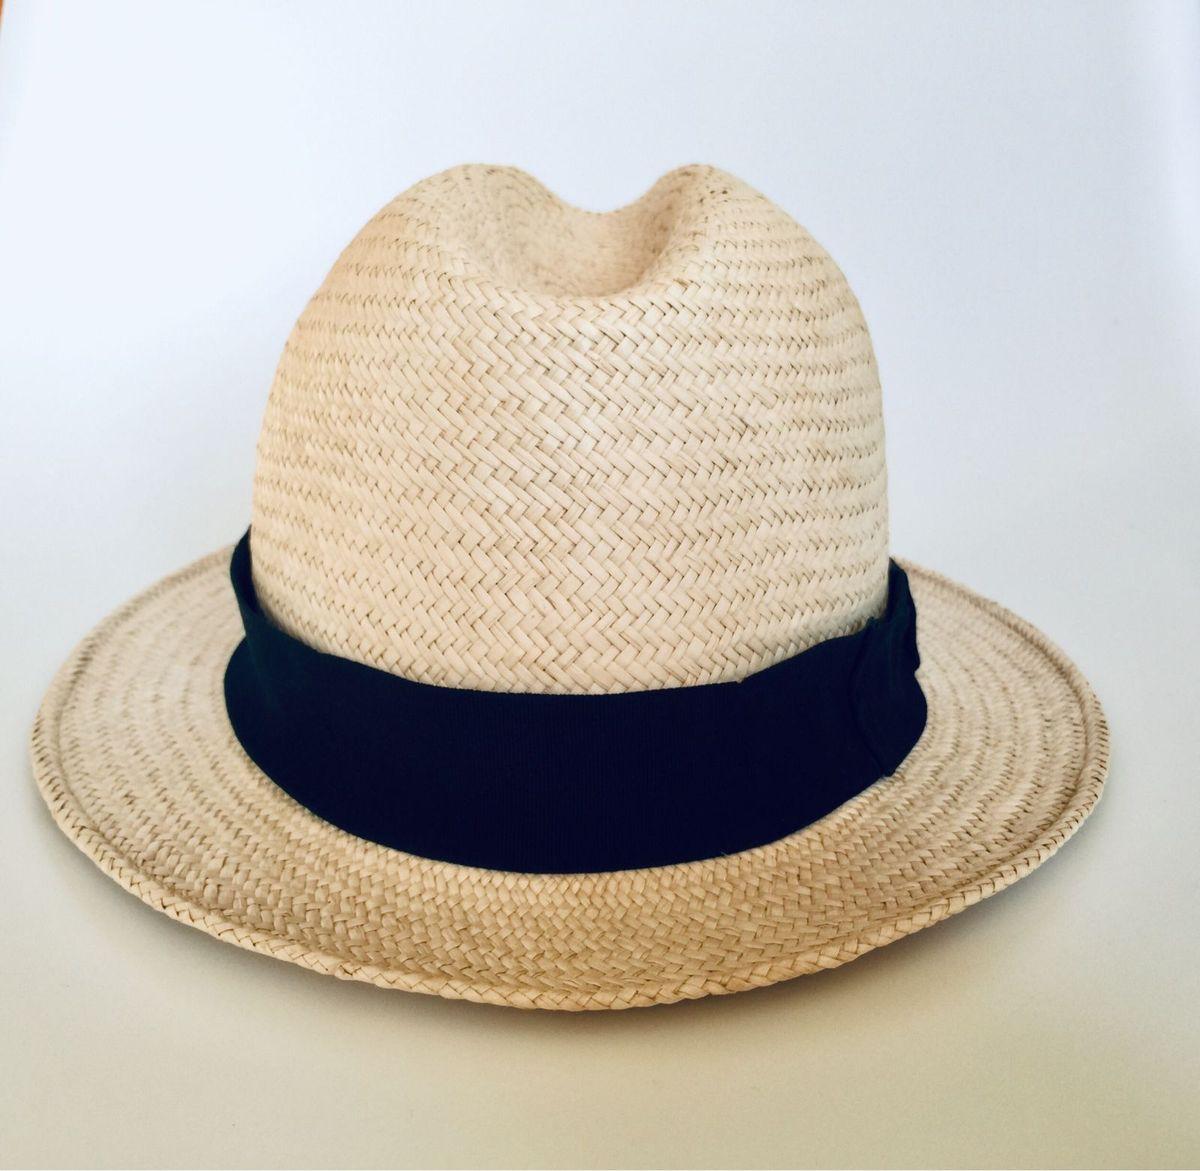 4fe4d08c196c9 chapéu panamá original - chapeu sem marca.  Czm6ly9wag90b3muzw5qb2vplmnvbs5ici9wcm9kdwn0cy83nje2mzc3lzfhn2ezogvlowmxogrlnjg1mmnkmgninwzlndc3nmfllmpwzw  ...